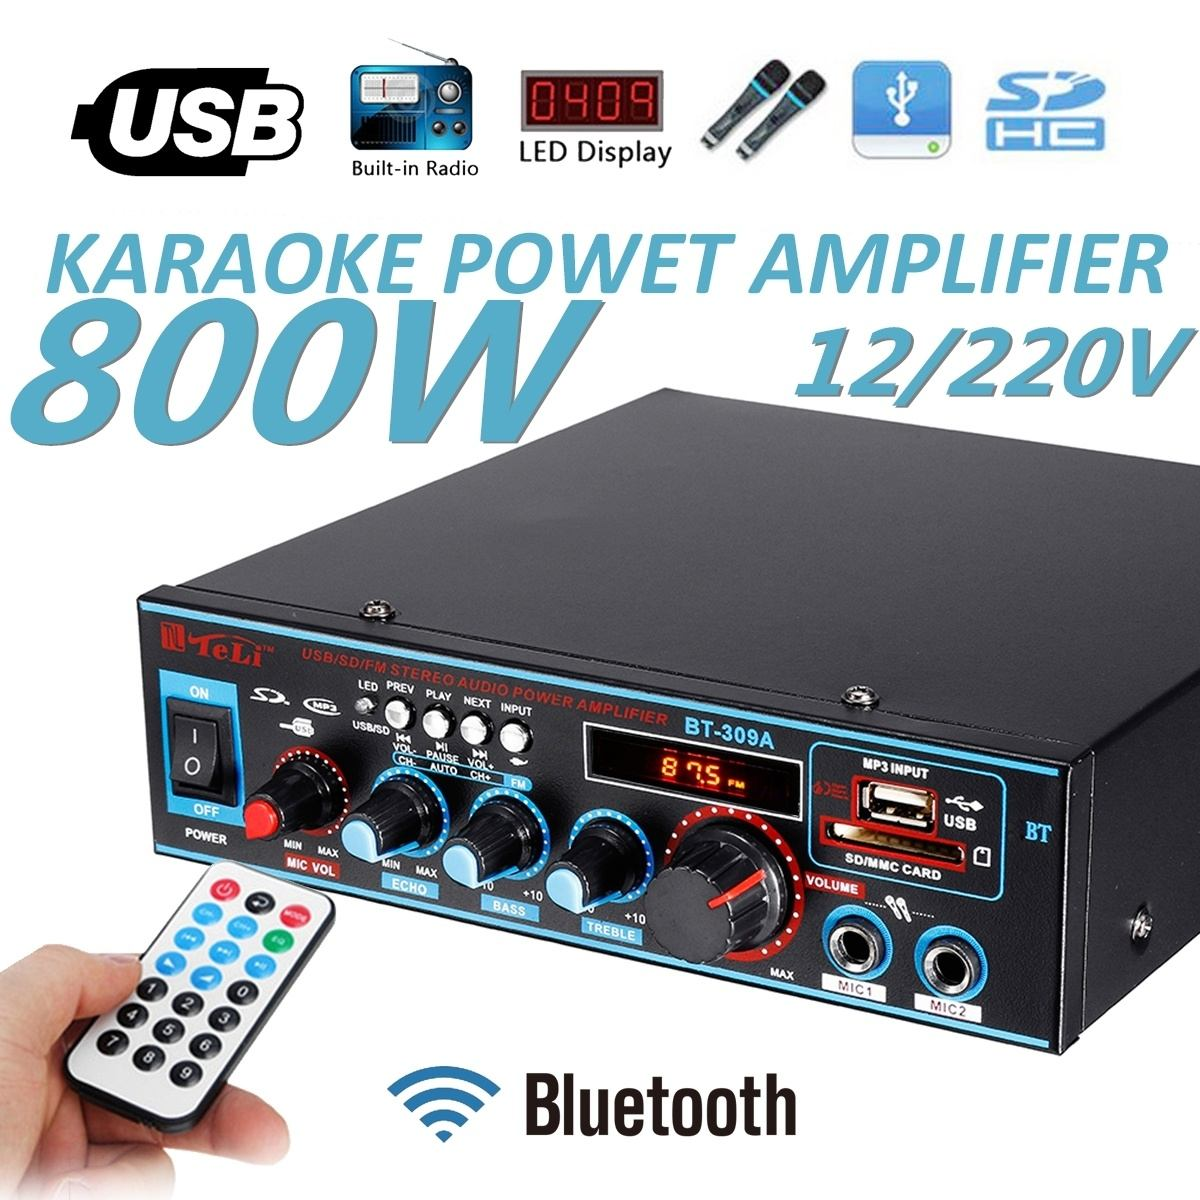 800W Audio Power Amplifier bluetooth HiFi Stereo Hi-Fi Amplifier FM Radio Home Theater Karaoke Amplifier with Remote Control title=